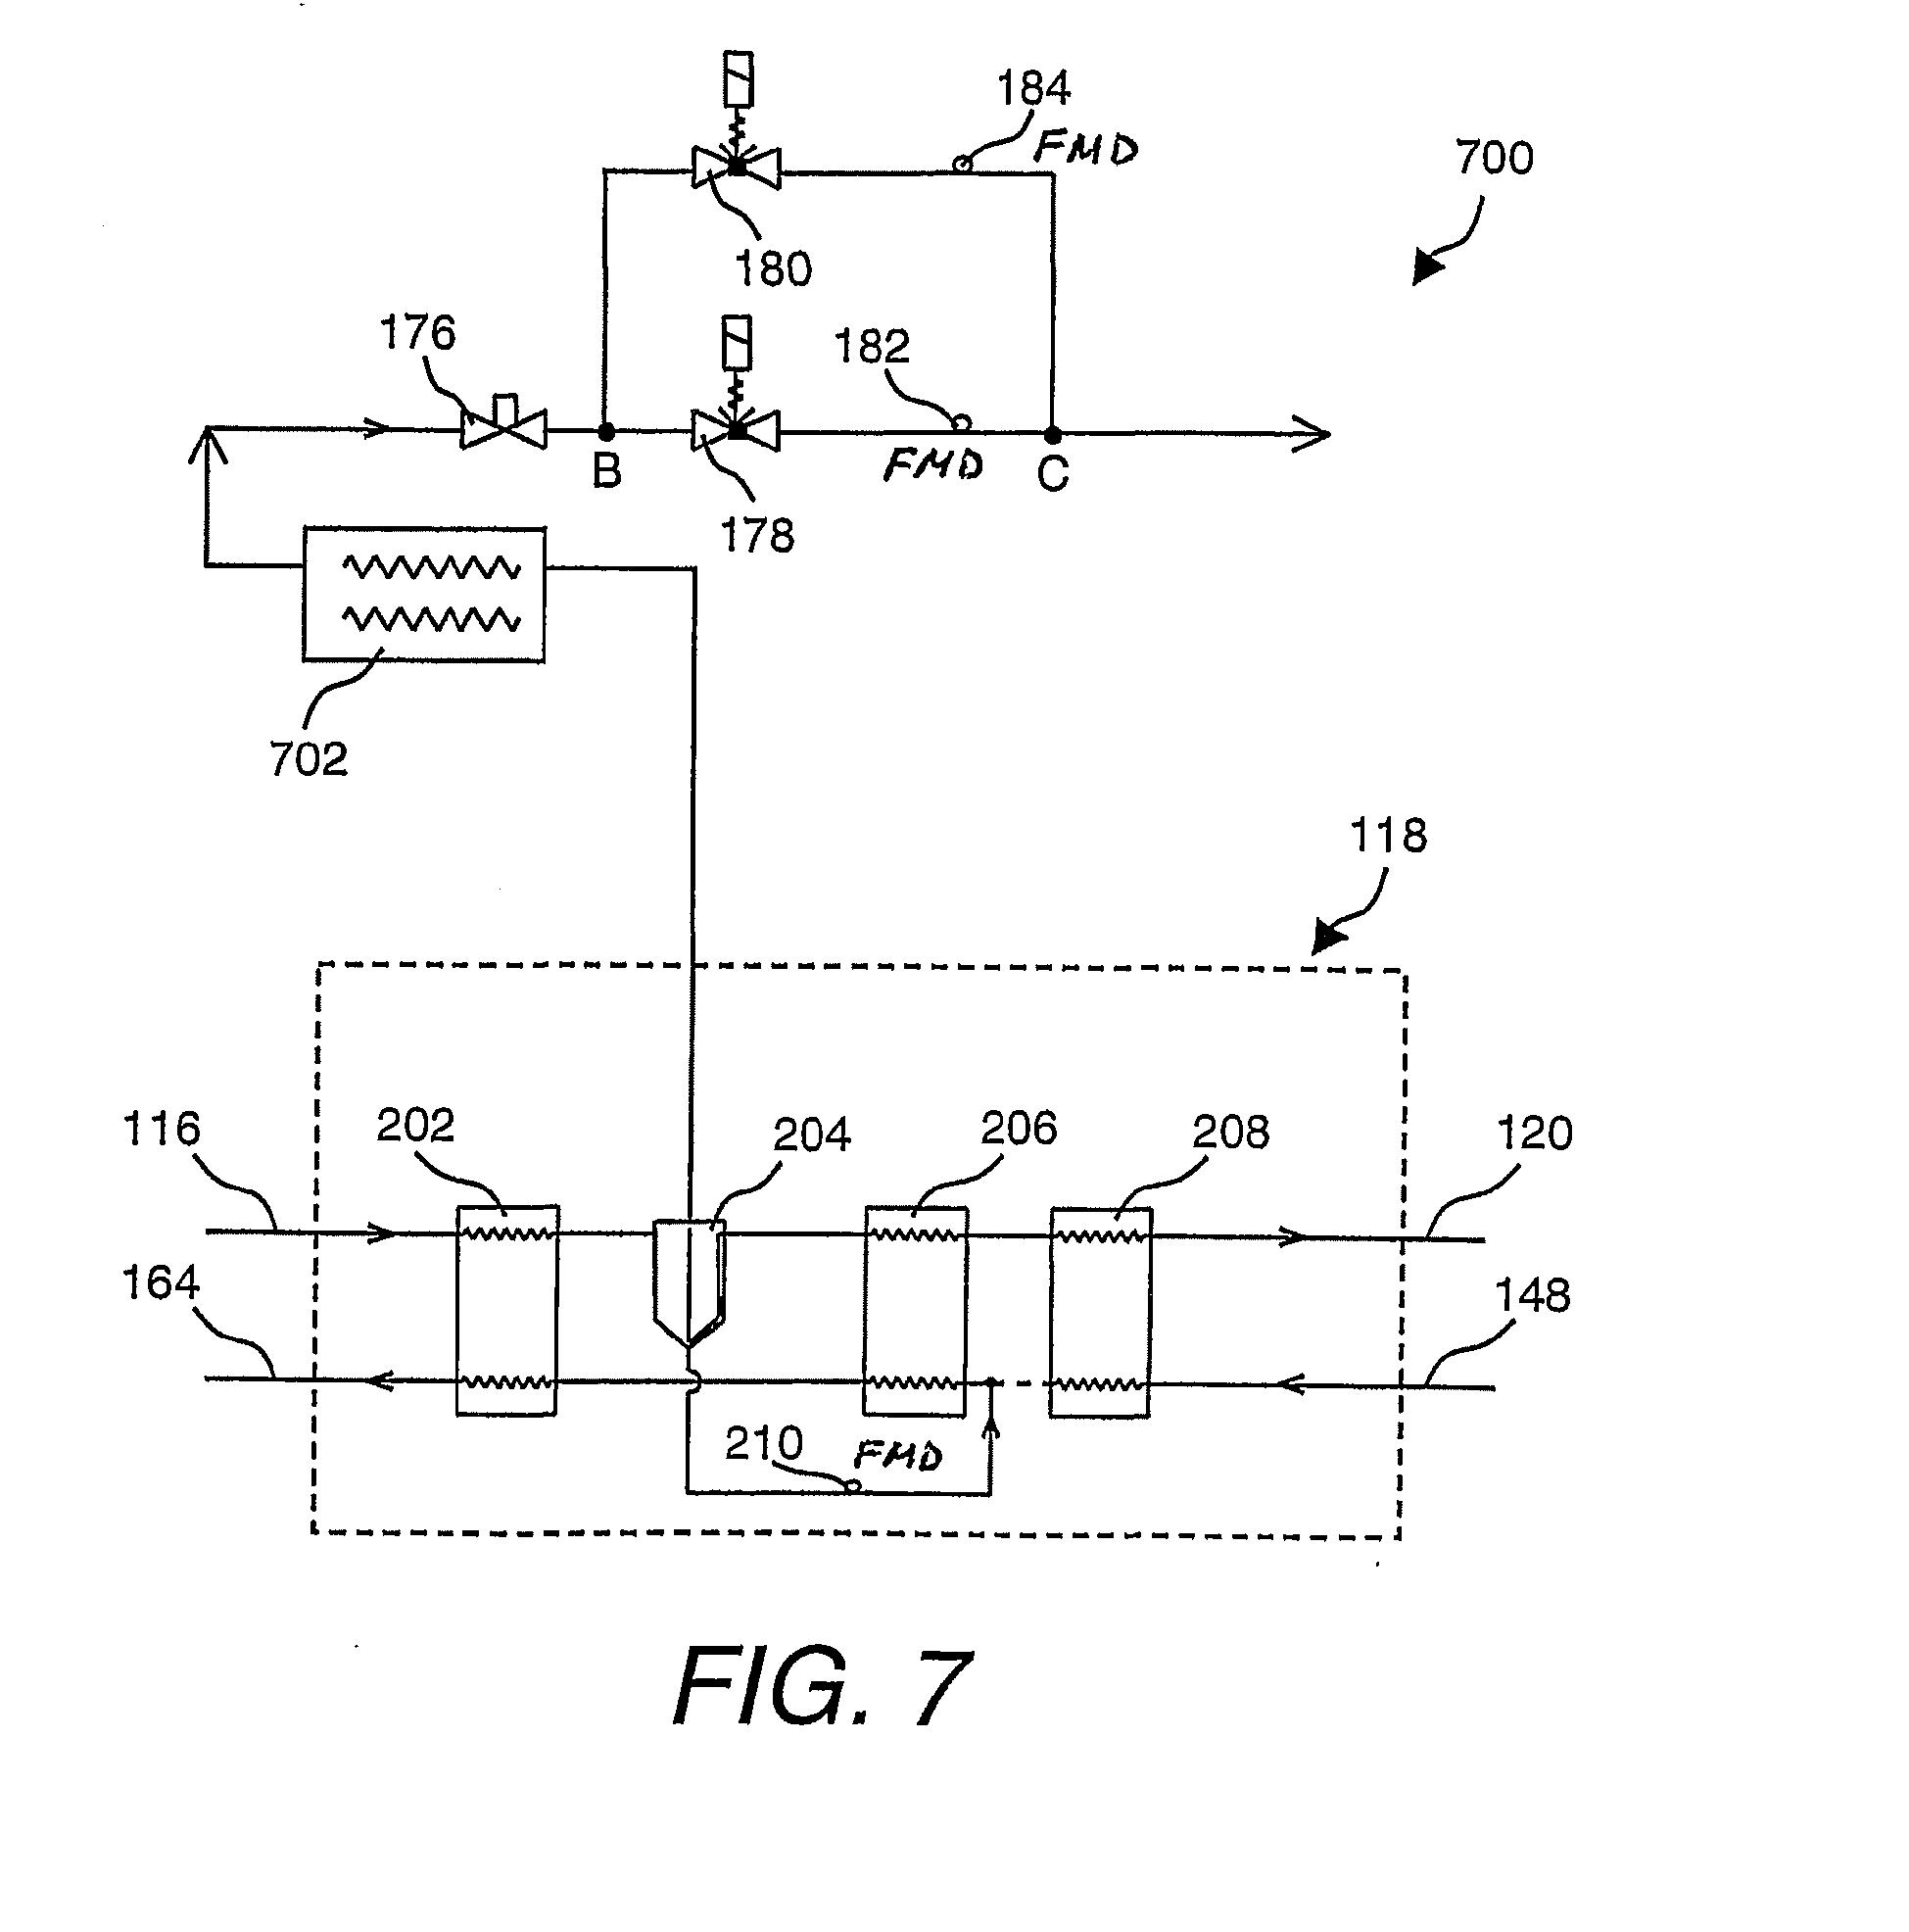 plumbing manifold diagram dali lighting control wiring piping free engine image for